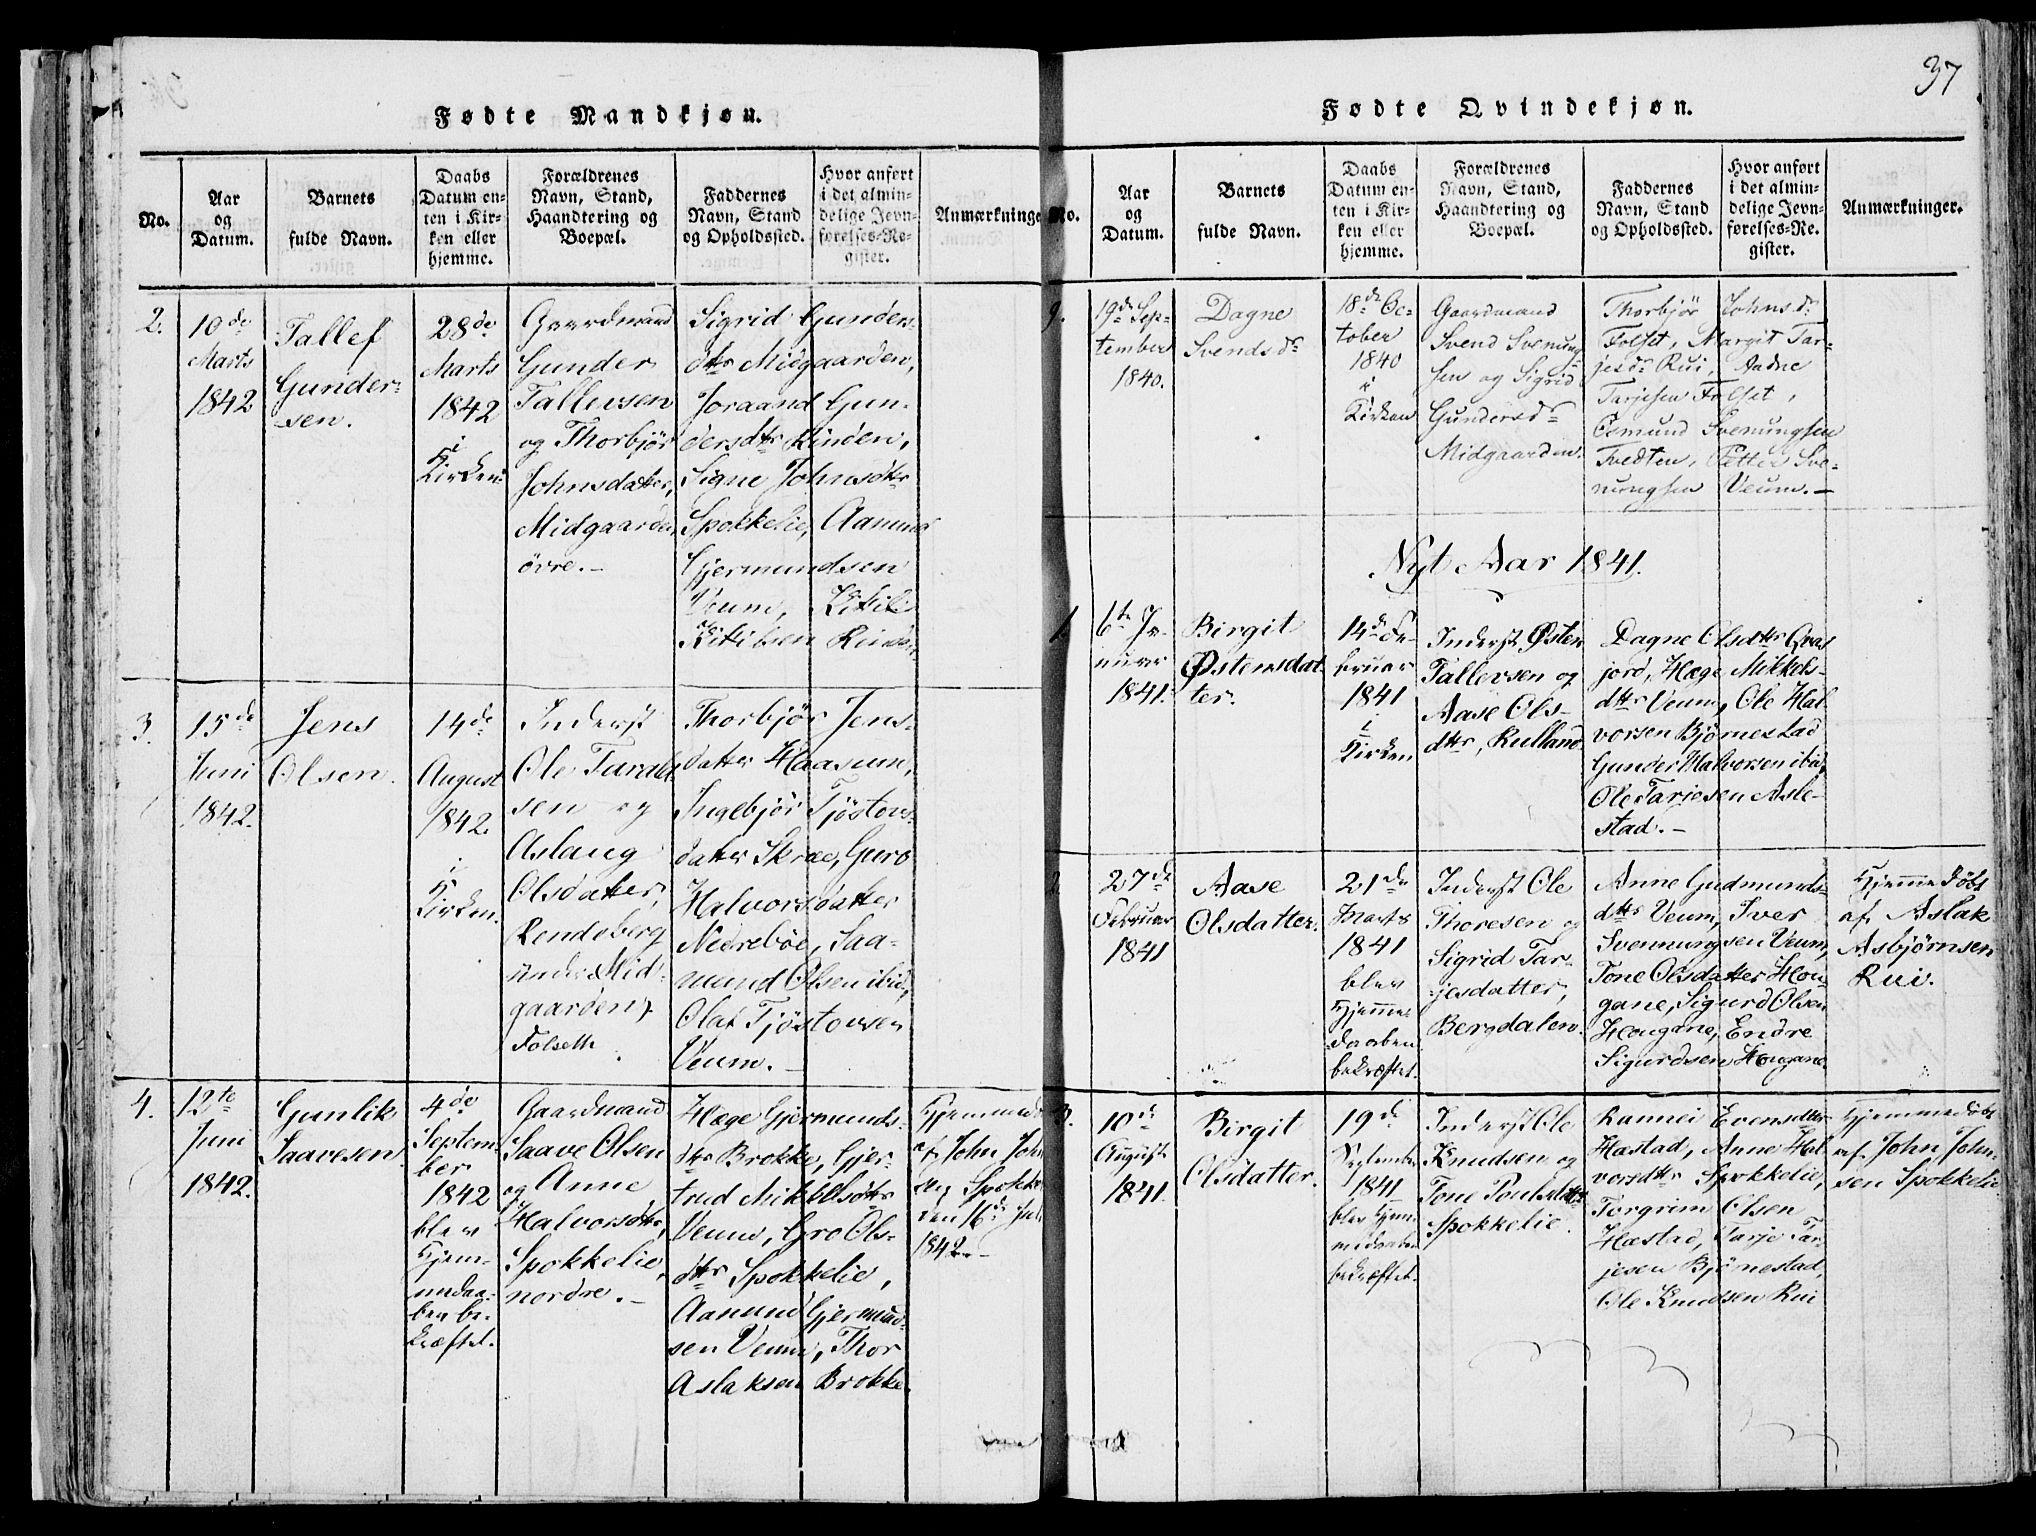 SAKO, Fyresdal kirkebøker, F/Fb/L0001: Ministerialbok nr. II 1, 1815-1854, s. 37